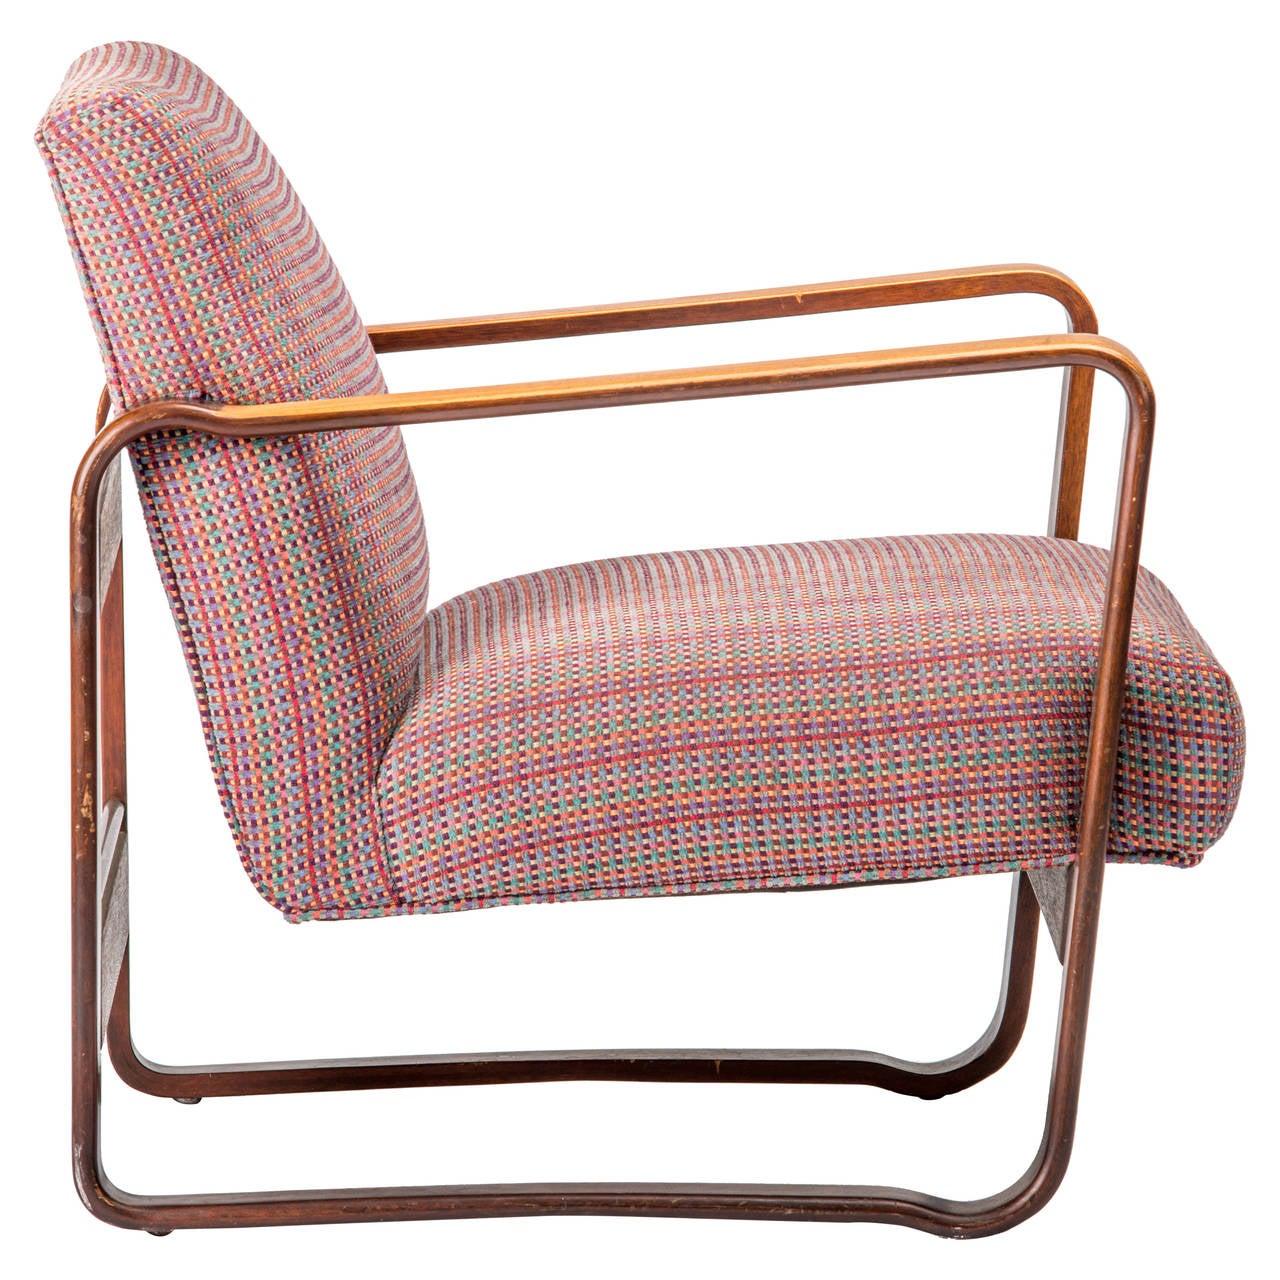 Edward Wormley for Dunbar Lounge Chair Model 4731